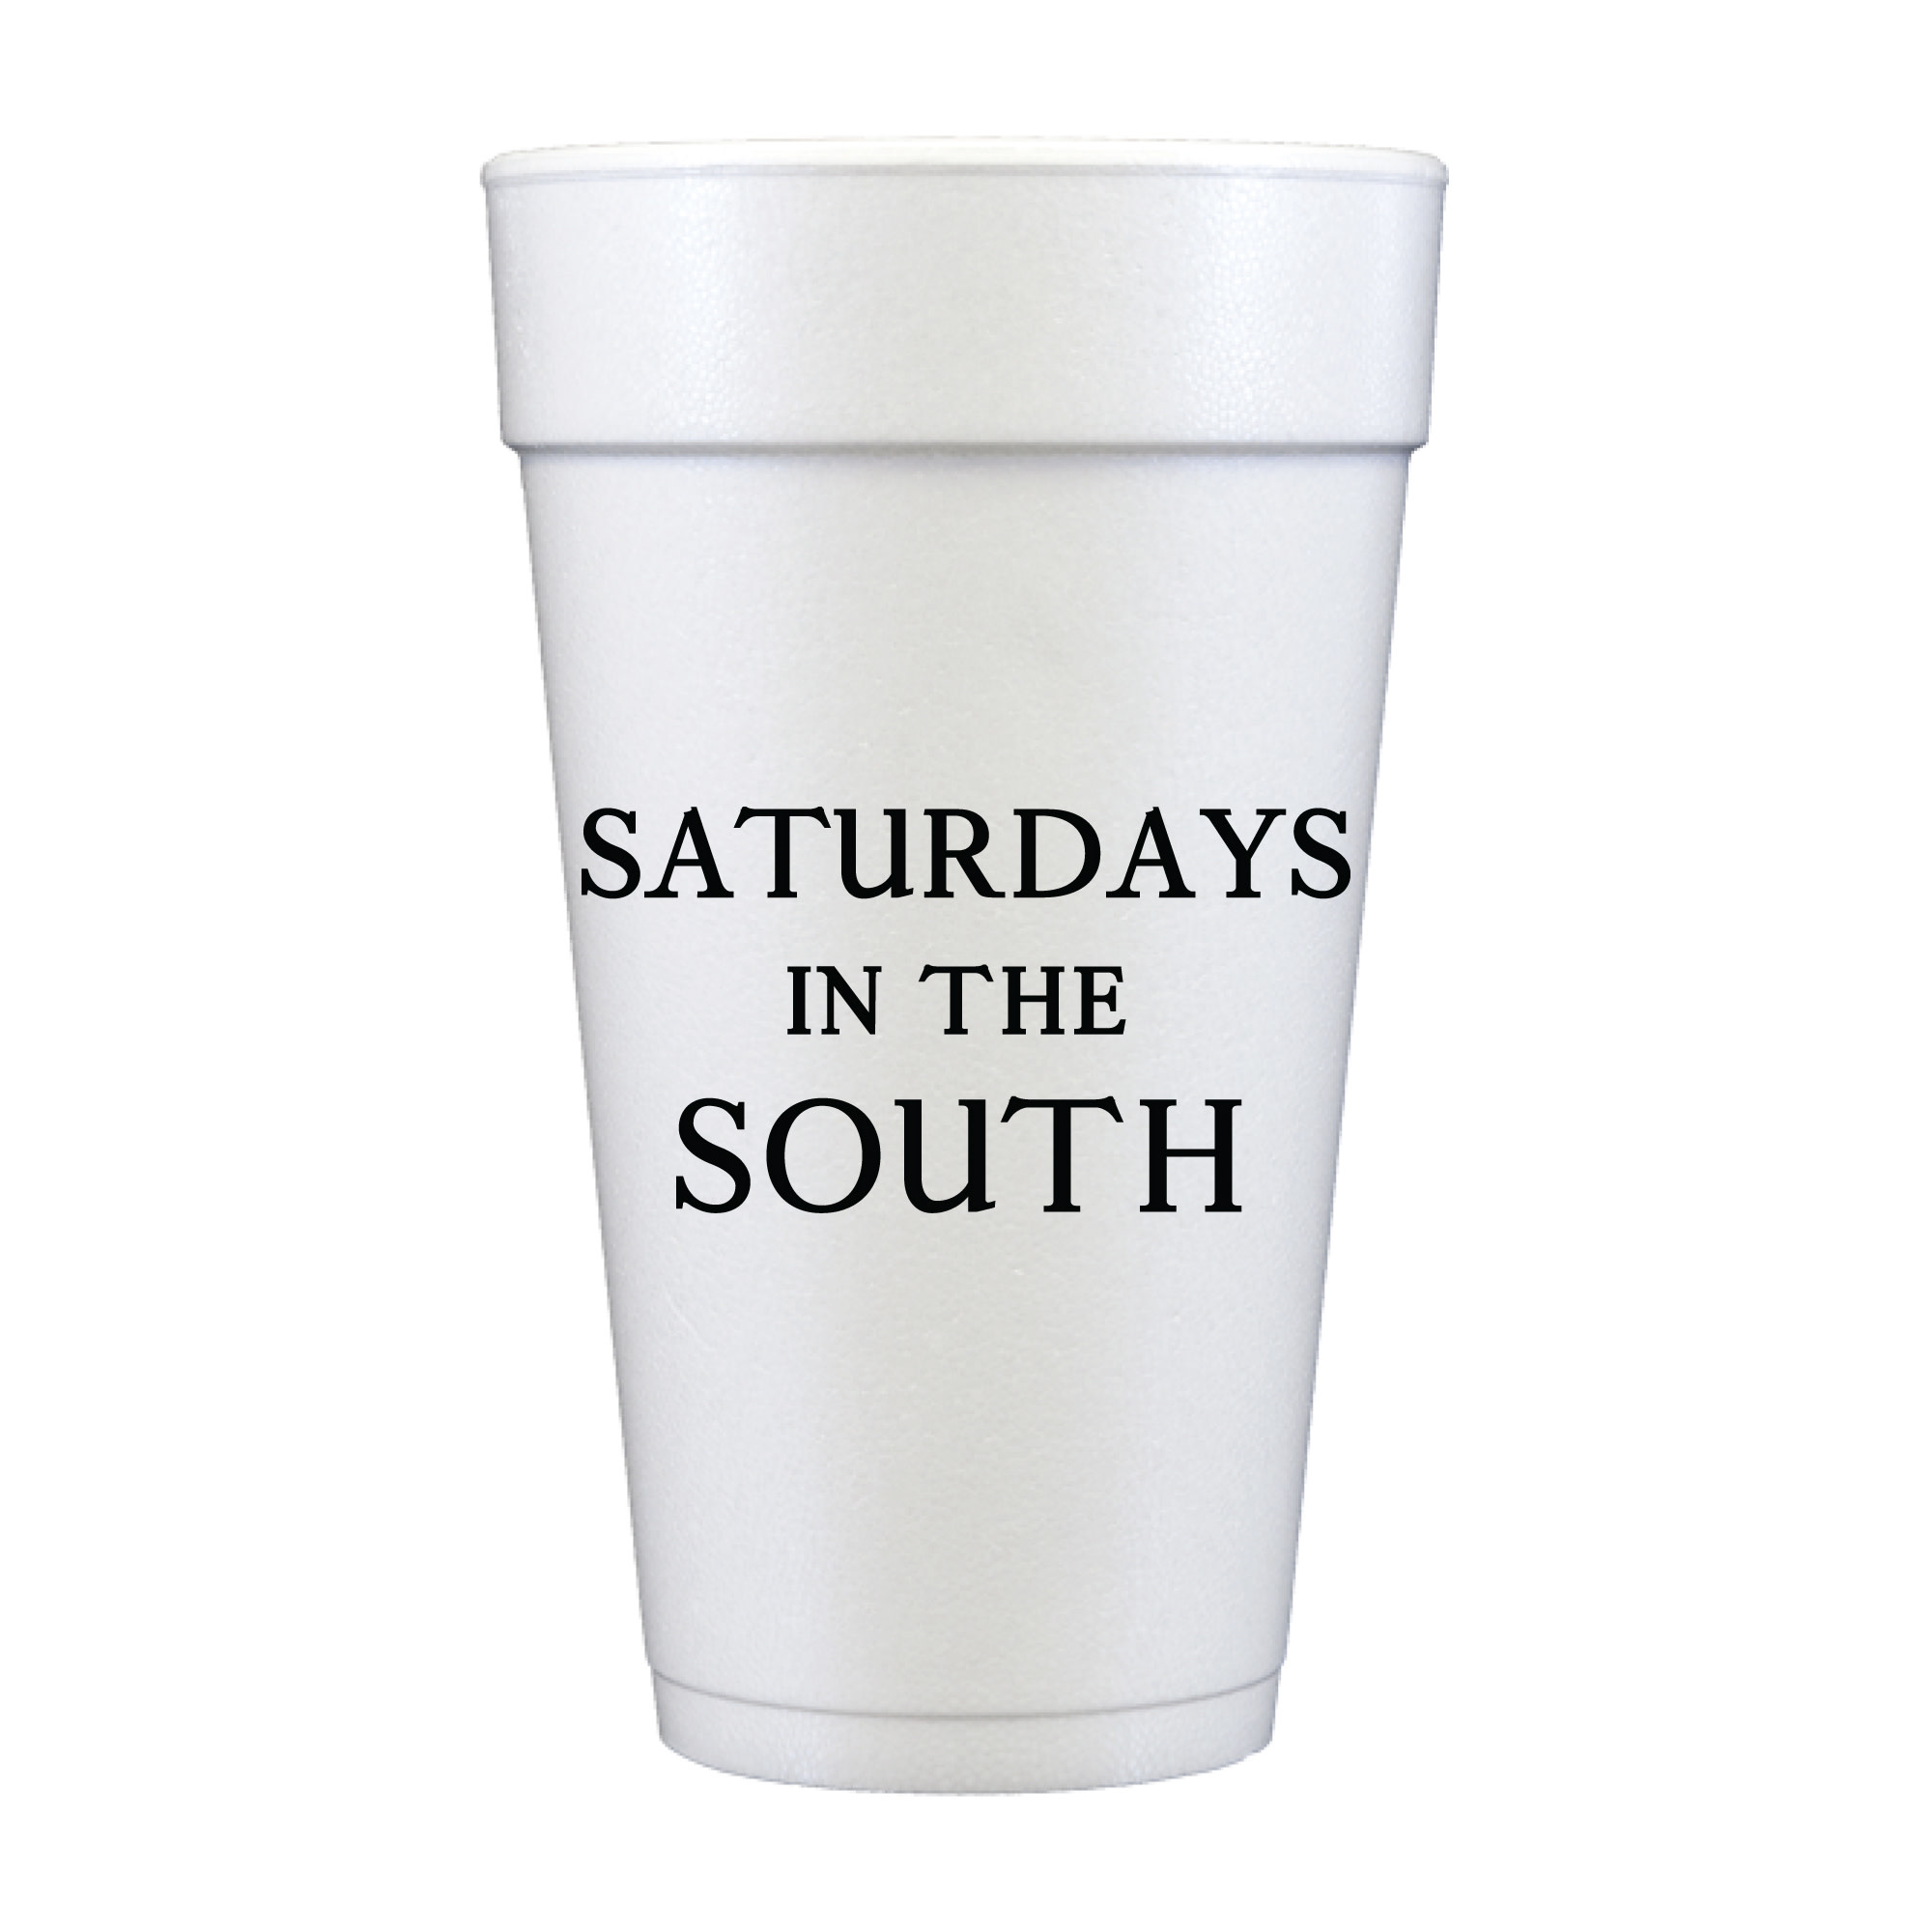 Sip Hip Hooray 20 oz. Saturdays in the South Foam Cup-Set of 10